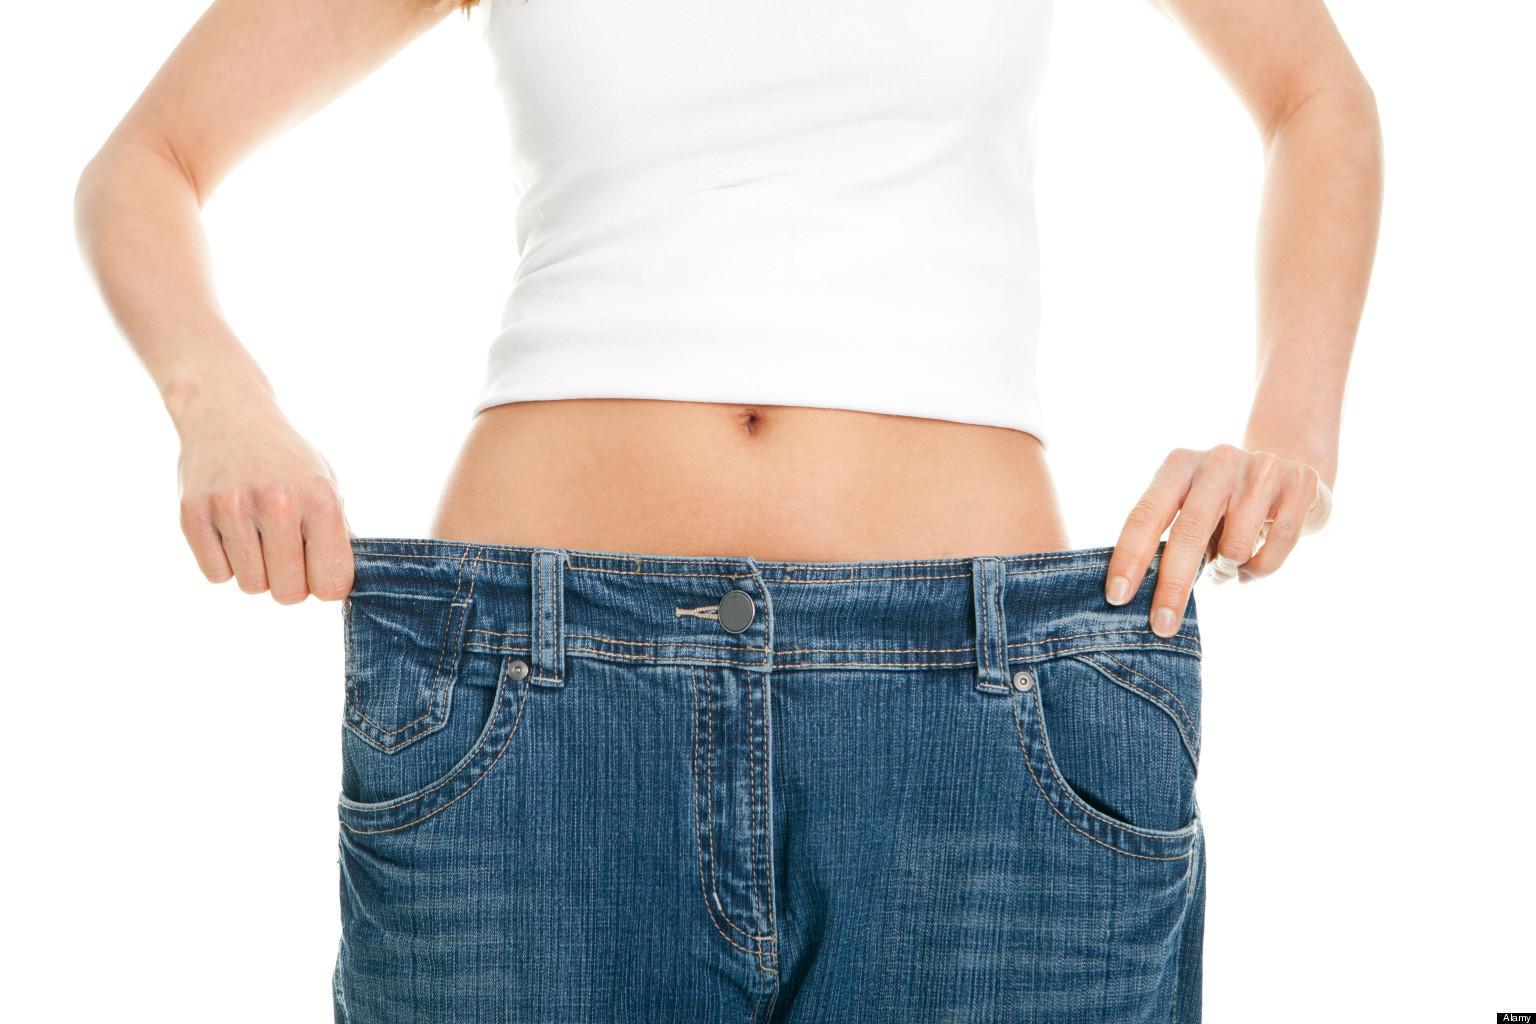 Six weight loss fruits